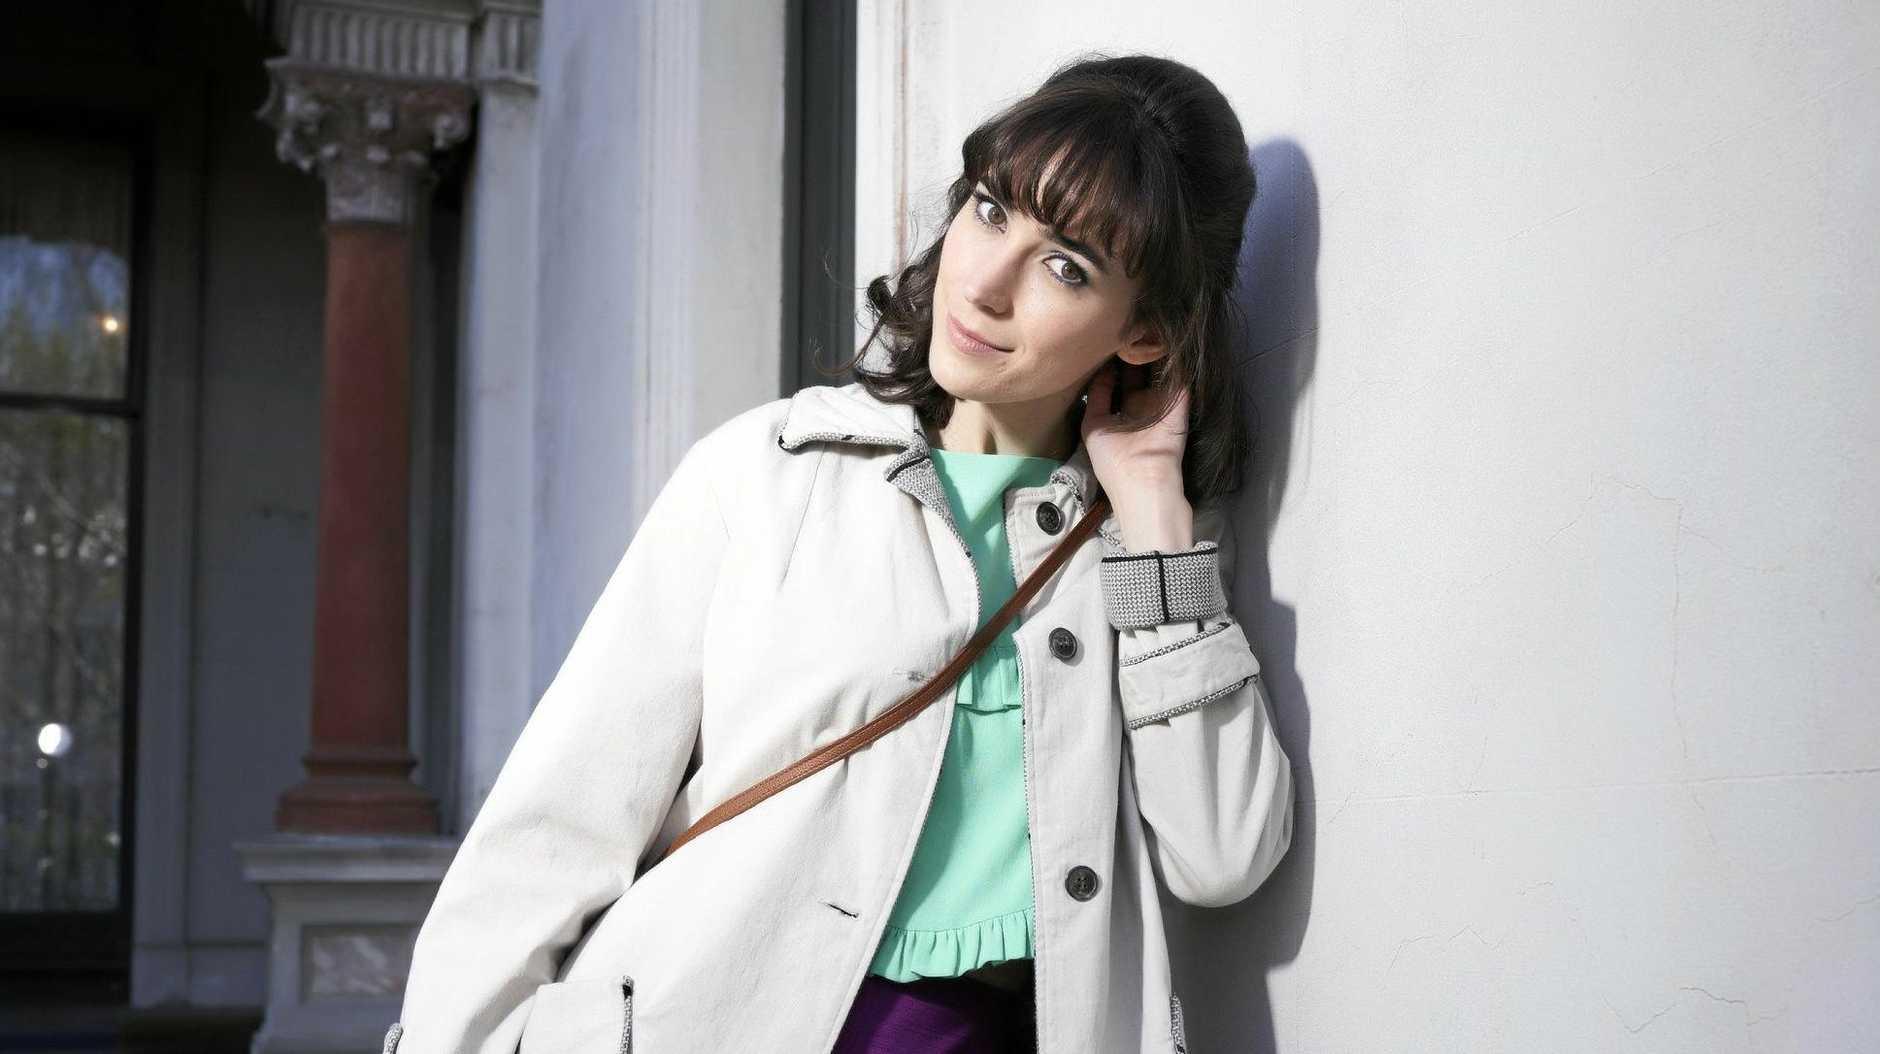 Geraldine Hakewill stars as Peregrine Fisher in the mini-series Ms Fisher's Modern Murder Mysteries.